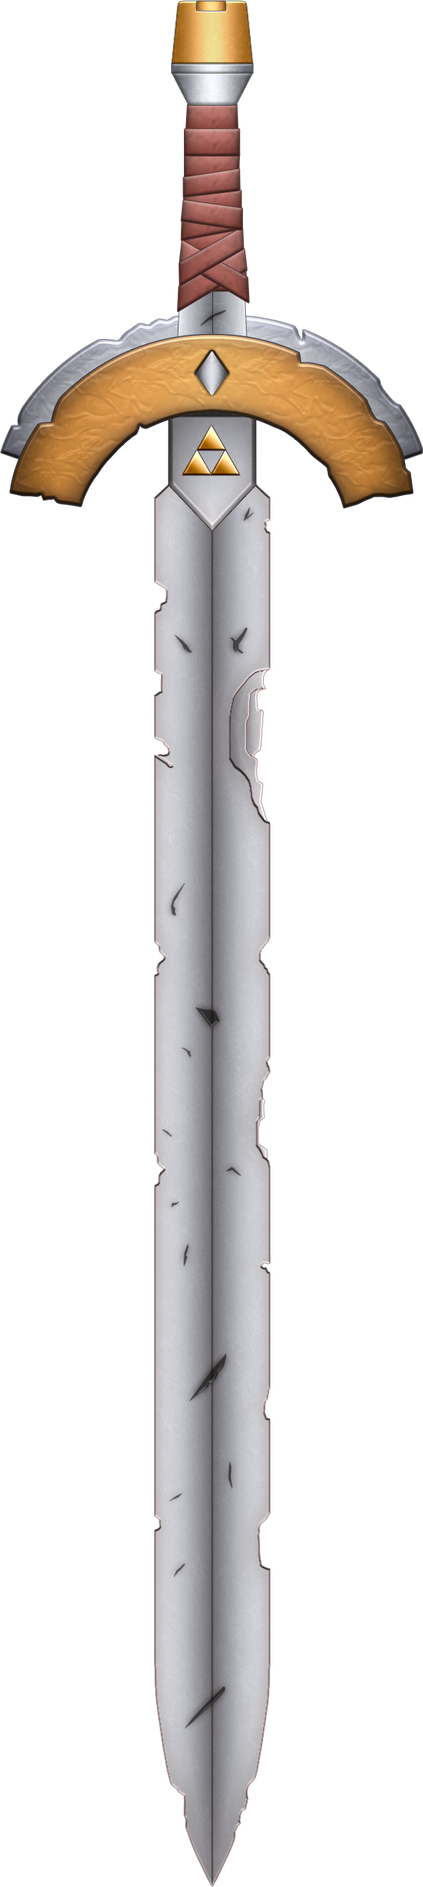 ALTTP Box Art Sword by BLUEamnesiac